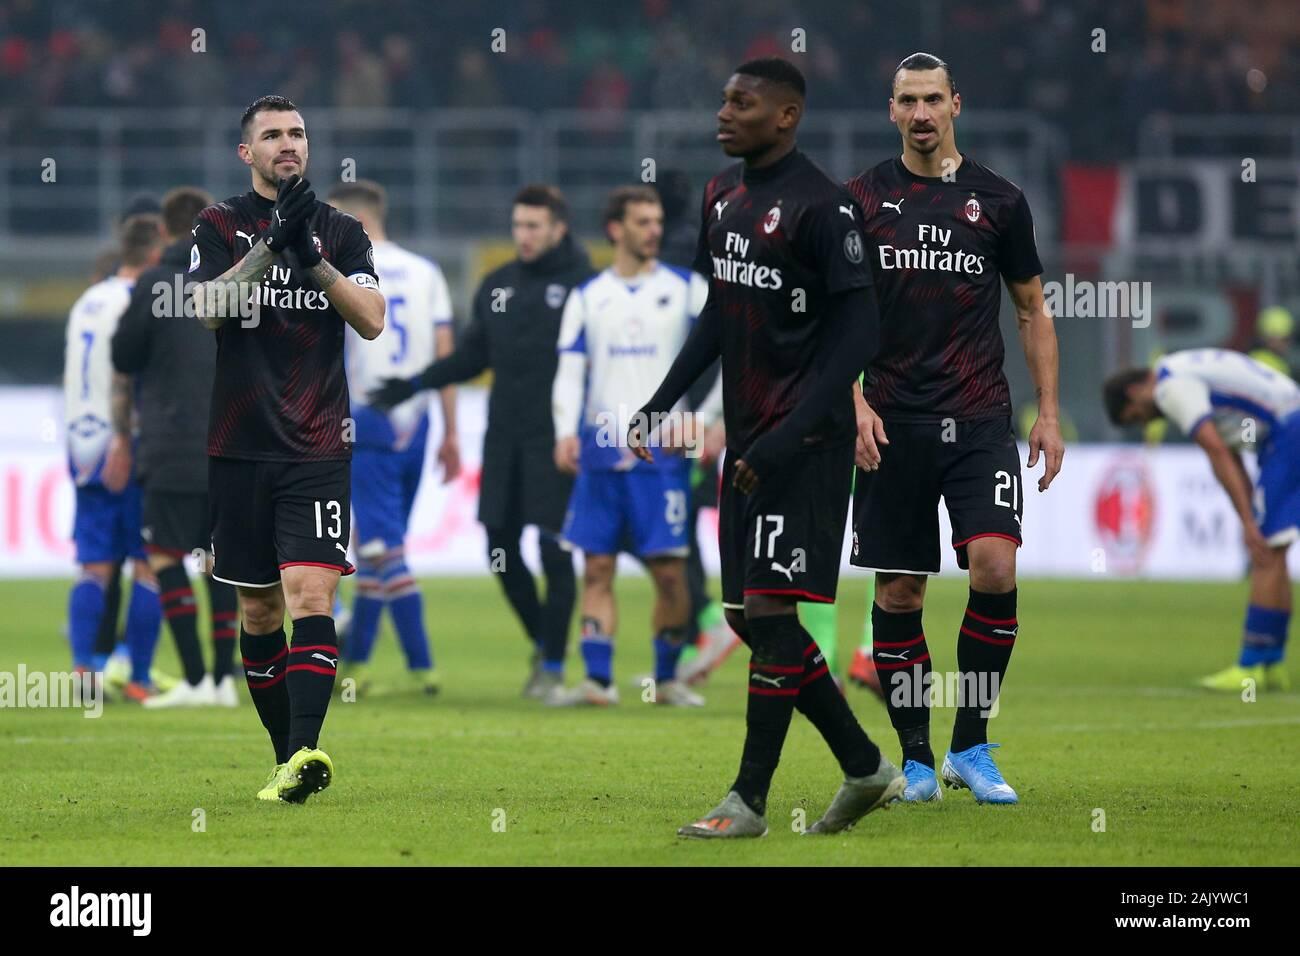 Milano Italy 06th Jan 2020 Alessio Romagnoli Milan During Ac Milan Vs Sampdoria Italian Soccer Serie